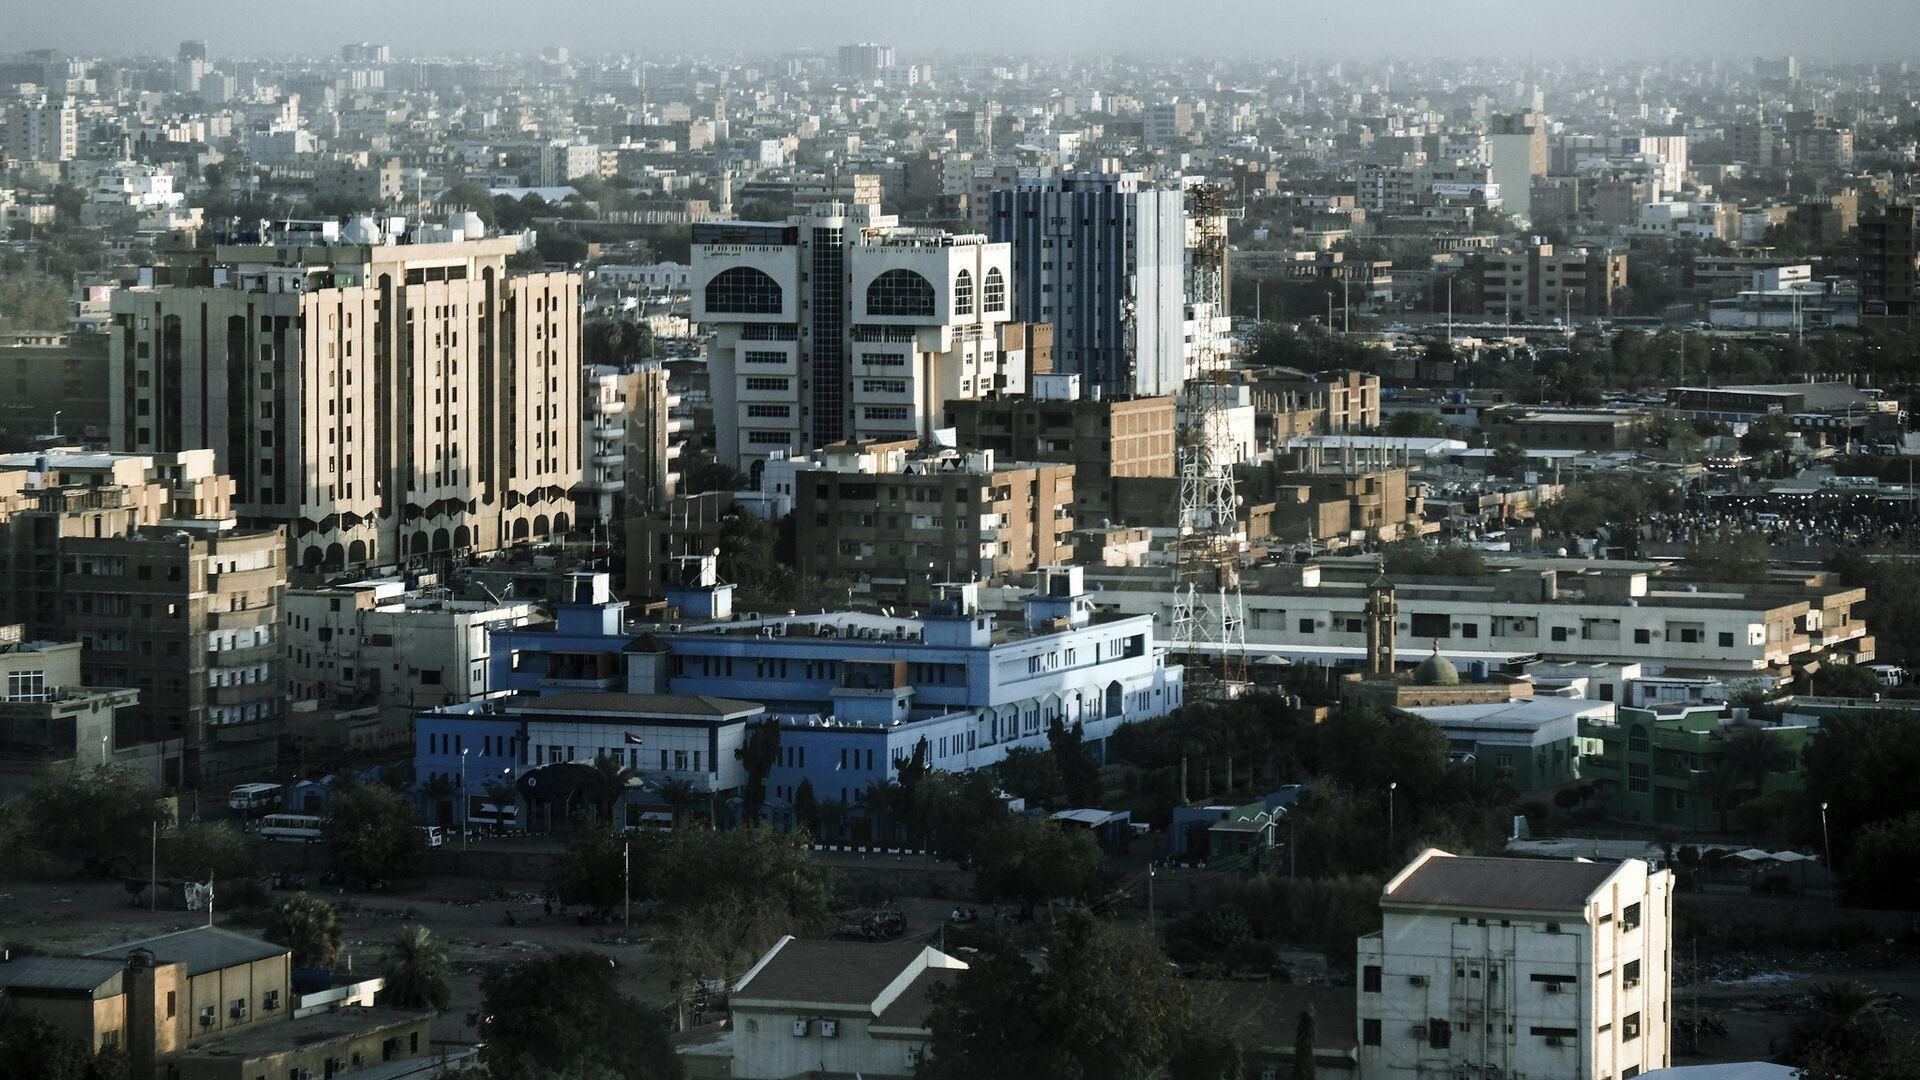 Khartoum, Soudan - Sputnik France, 1920, 21.09.2021